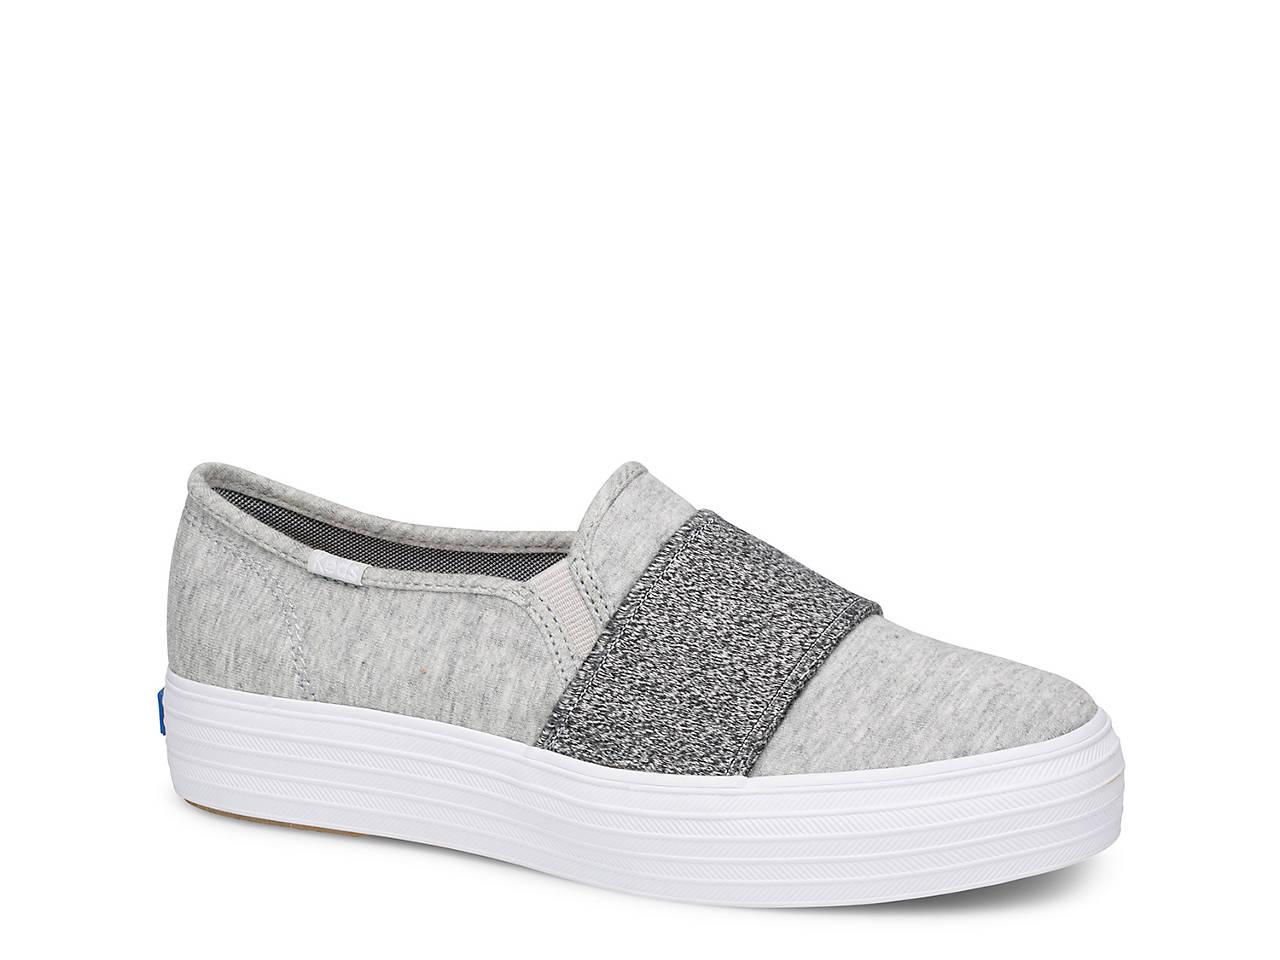 new product e2526 99f67 Keds Triple Bandeau Platform Slip-On Sneaker - Women s Women s Shoes ...